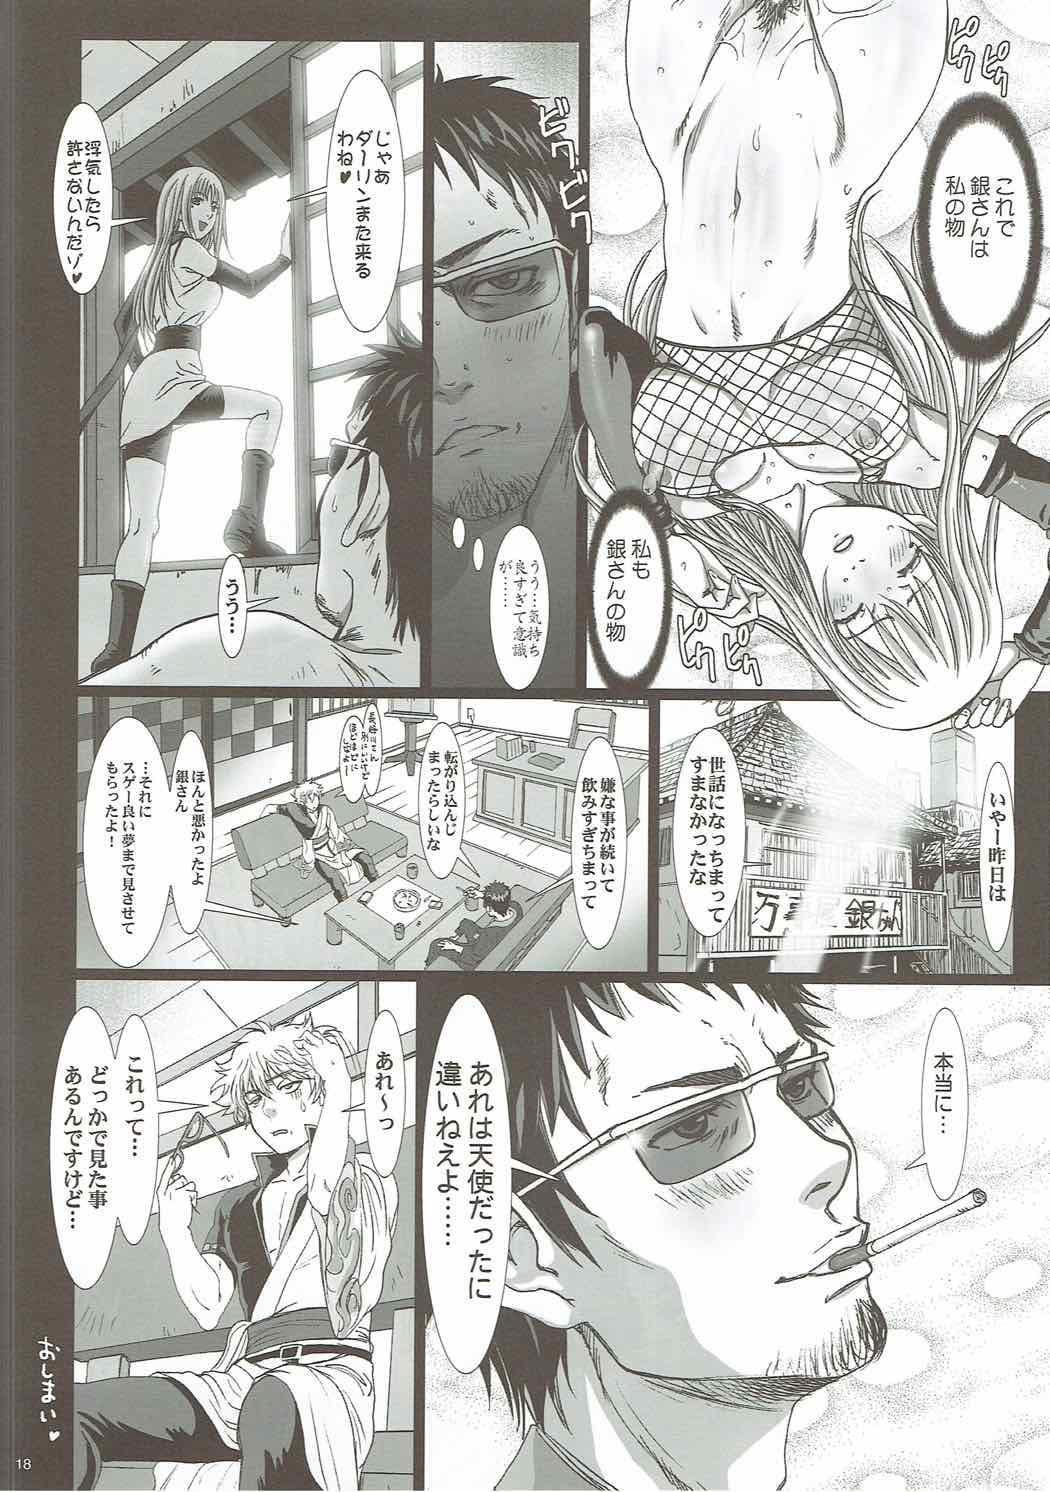 Sacchan wa Kunoichi dazo? 14